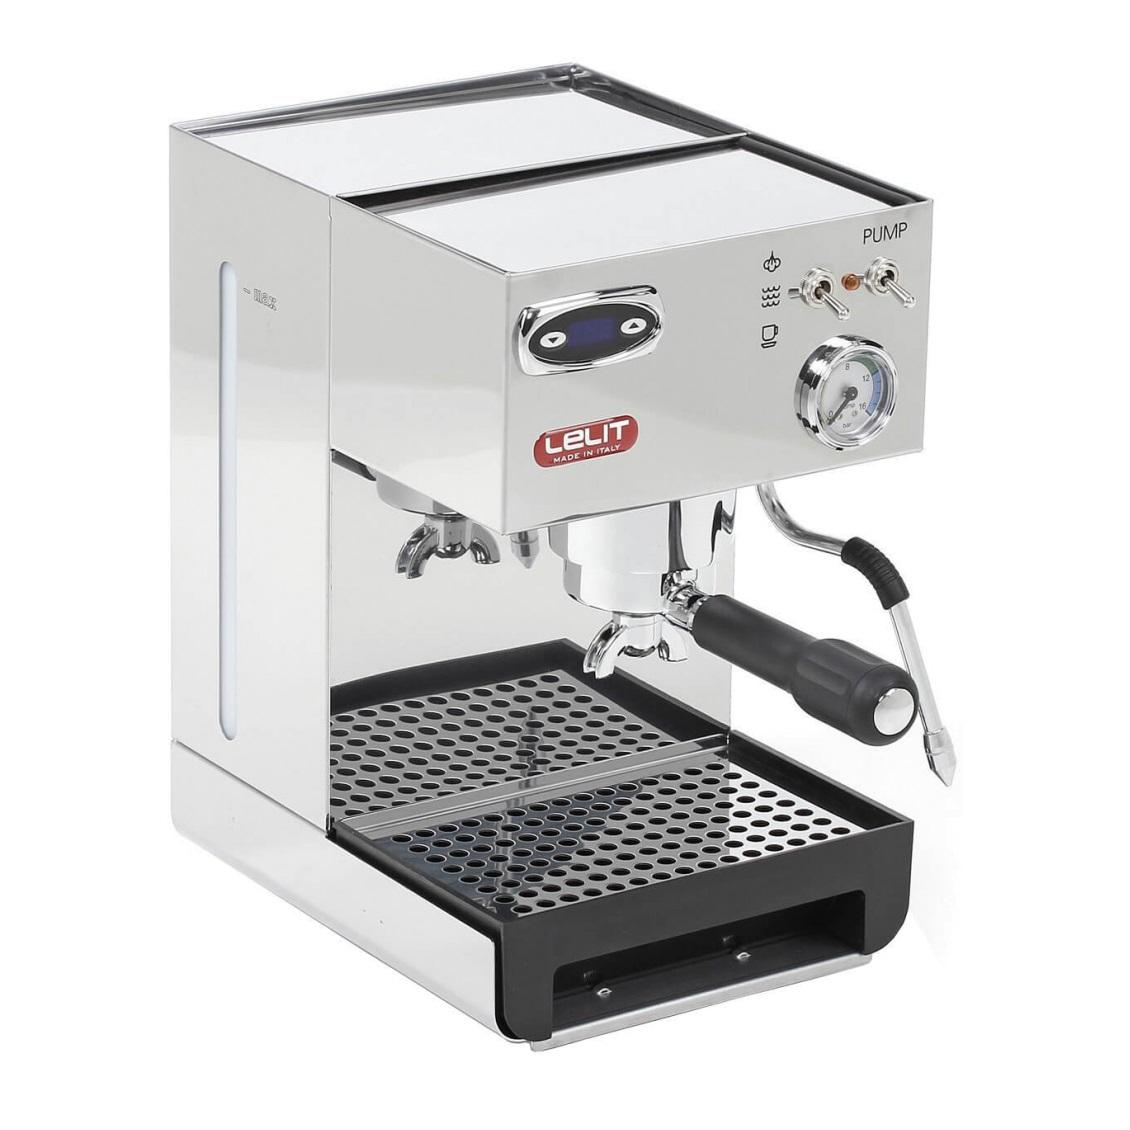 Espressor manual Lelit PL 41 TEM, 1050 W, 2.7 L, 15 bar, manometru, PID